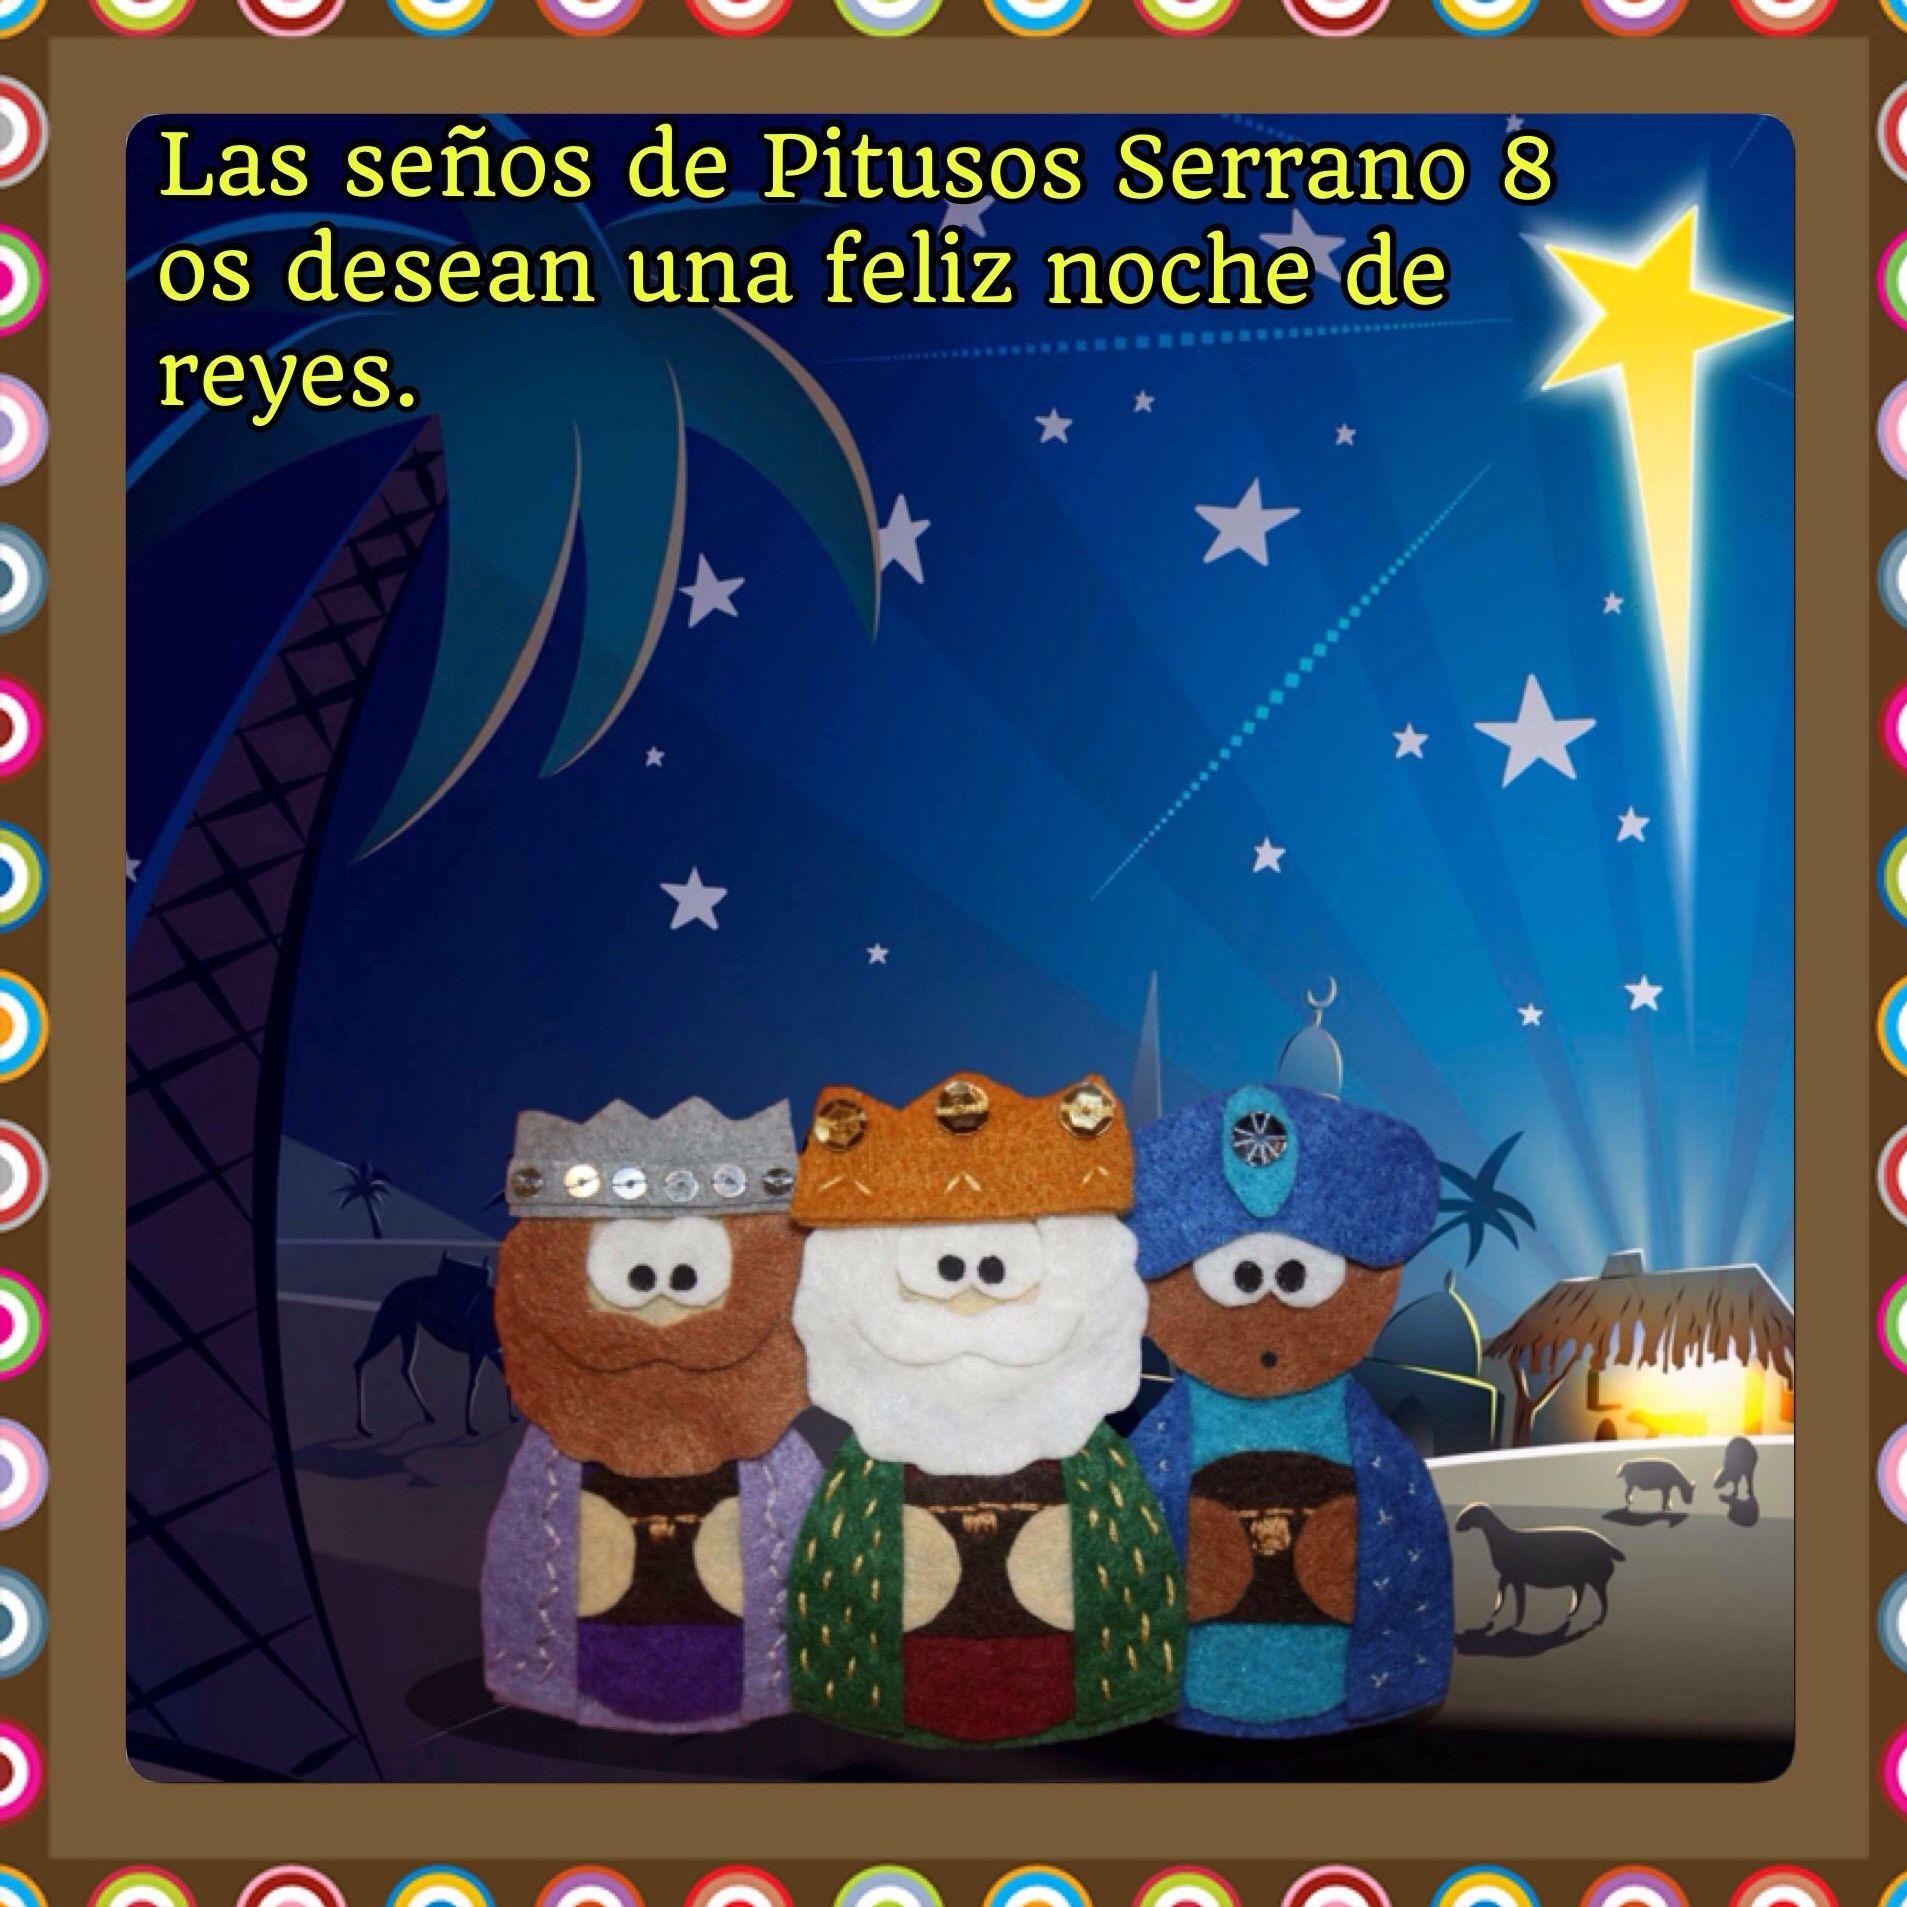 Feliz noche de Reyes!!!!!